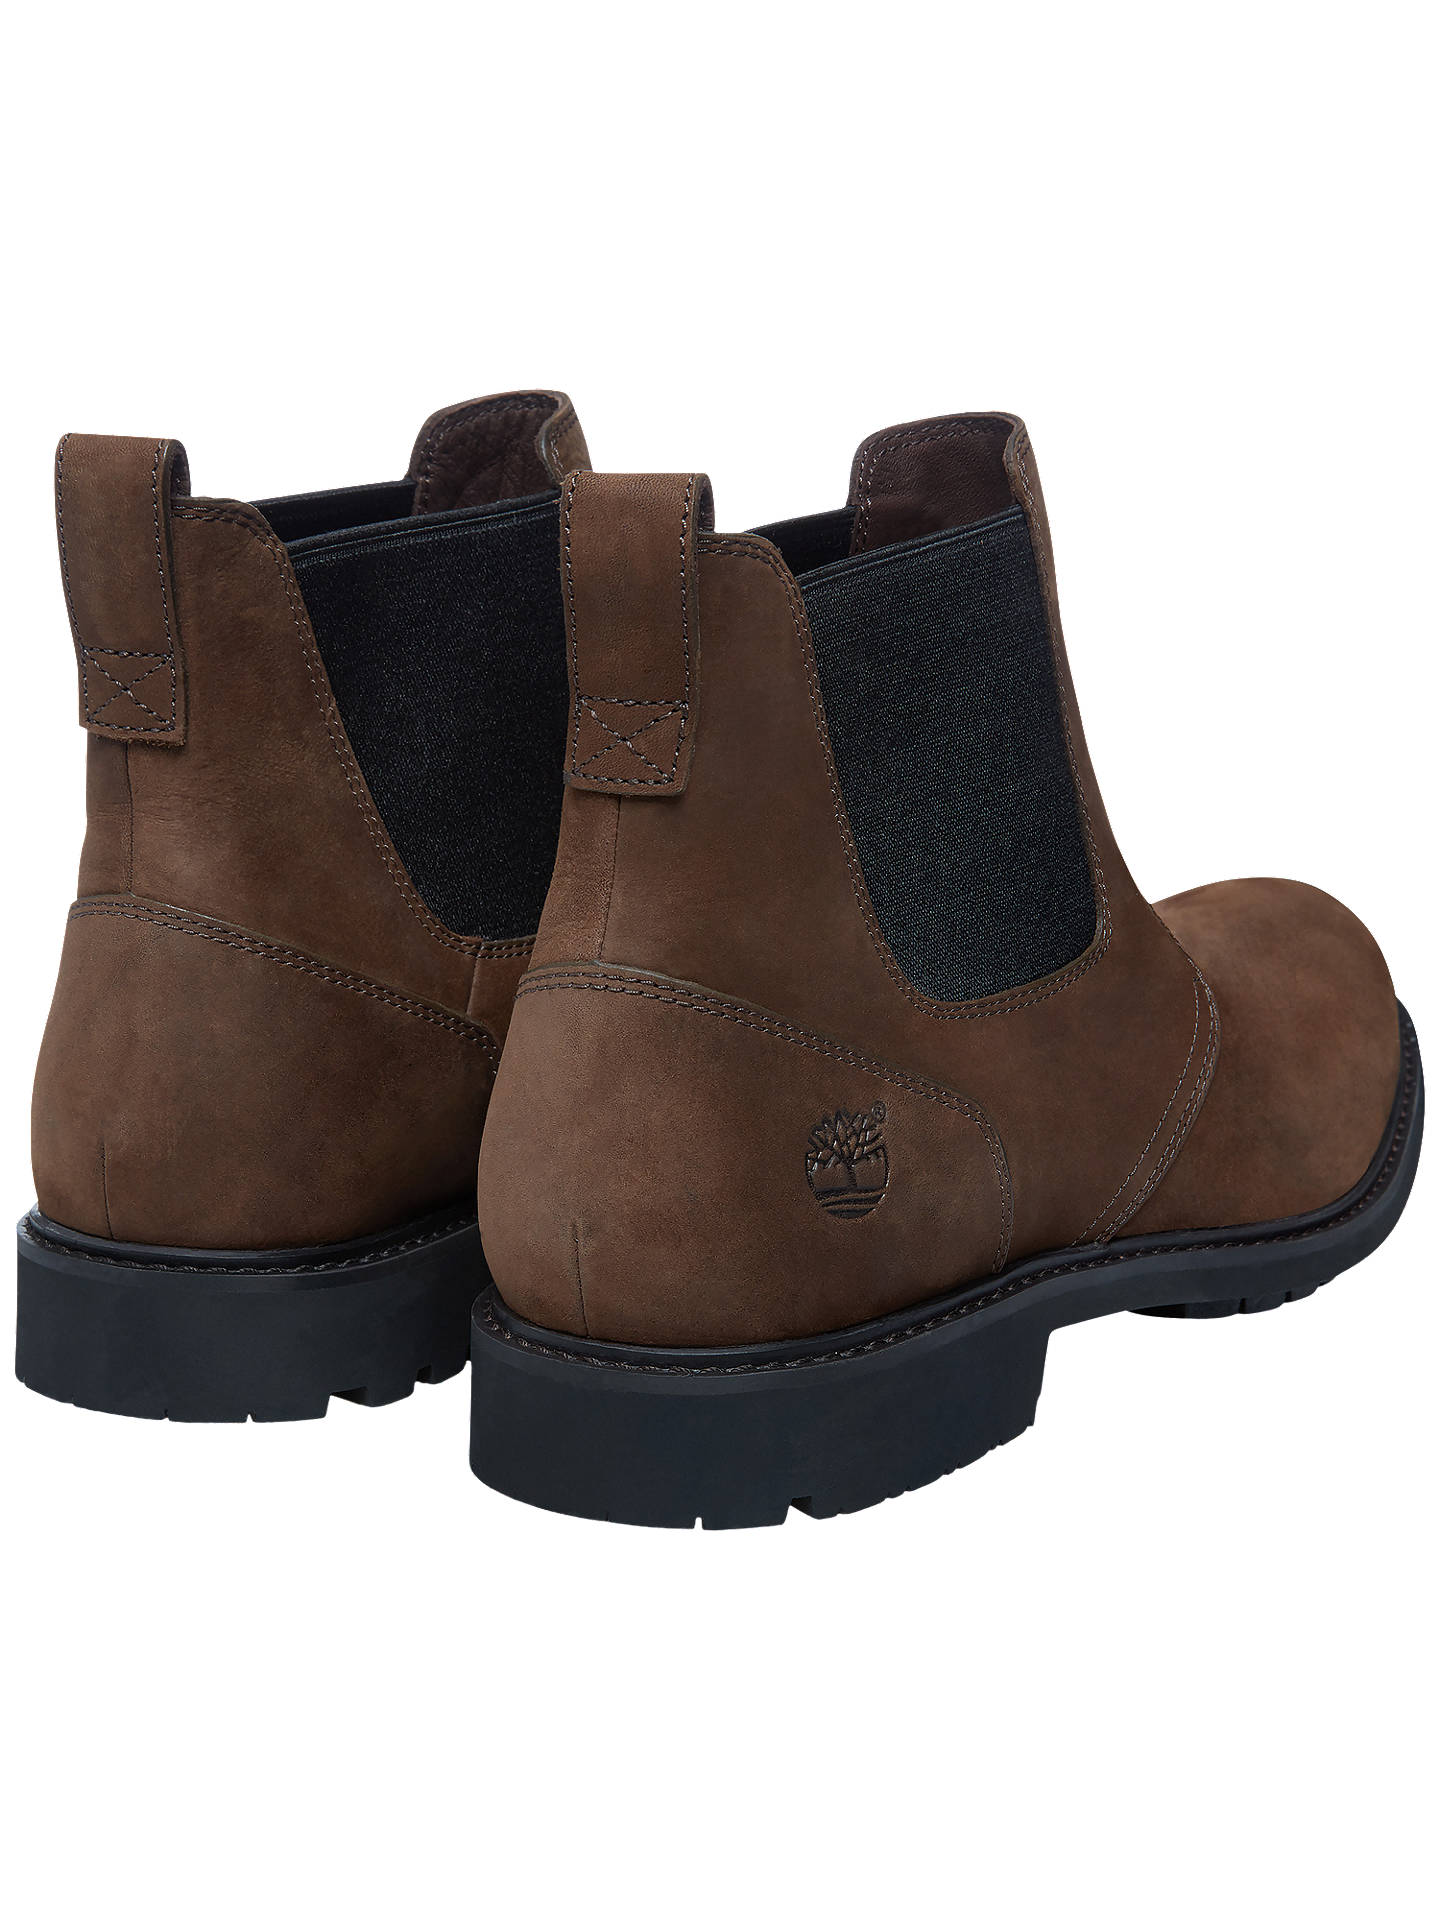 427db75c254 Timberland Stormbuck Waterproof Chelsea Boots, Dark Brown at John ...